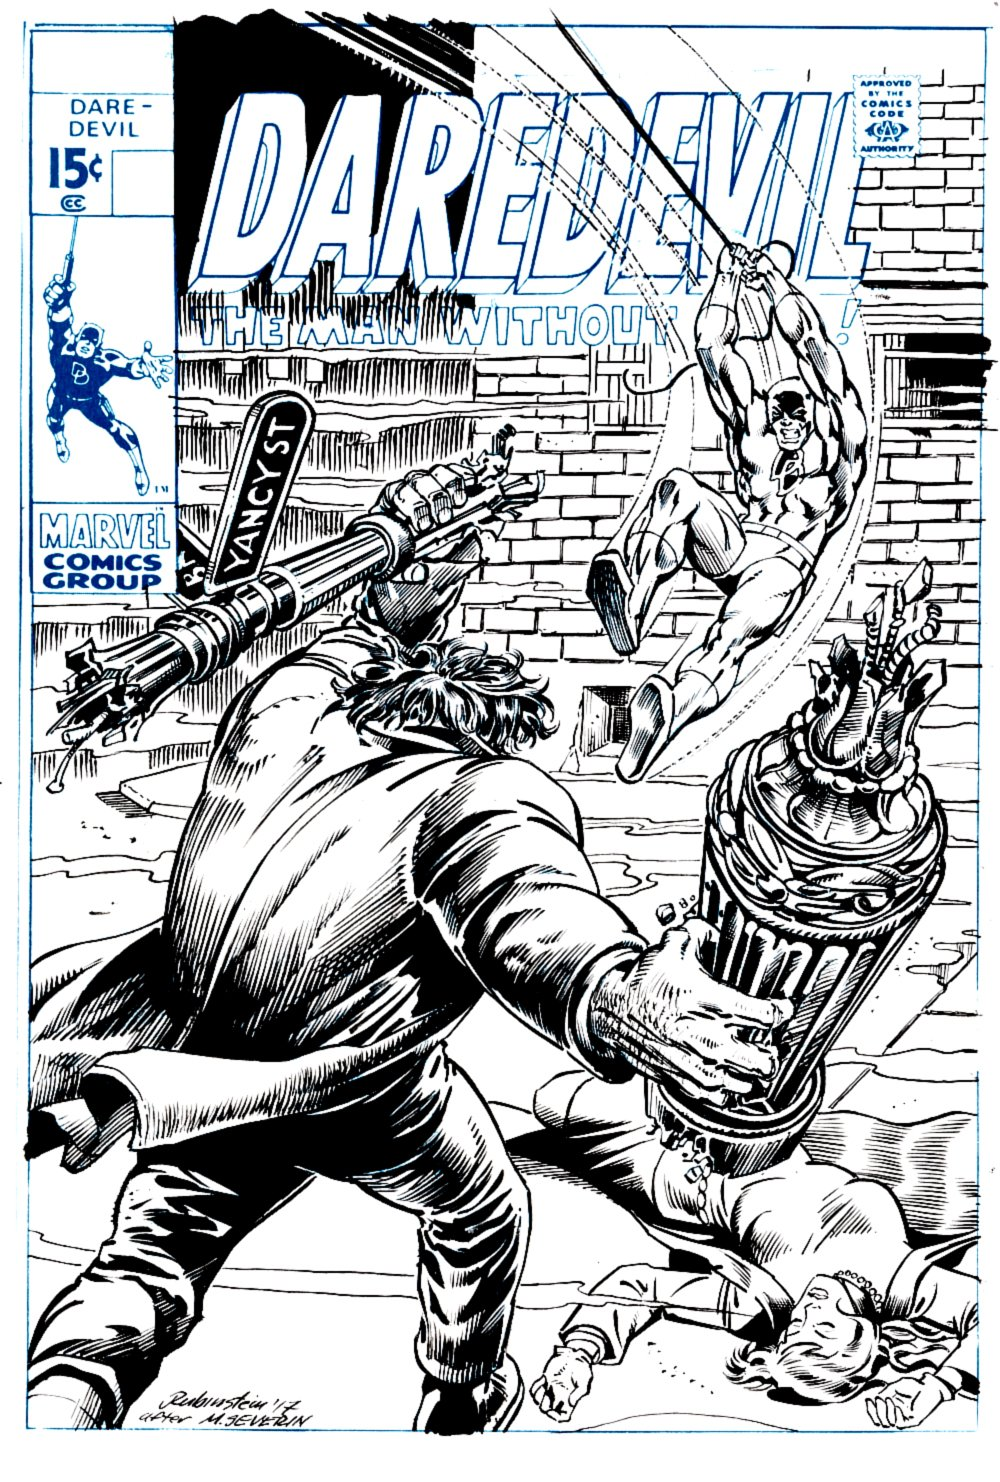 Daredevil #65 Cover Recreation (Daredevil Battles Brother Brimstone!) 2017